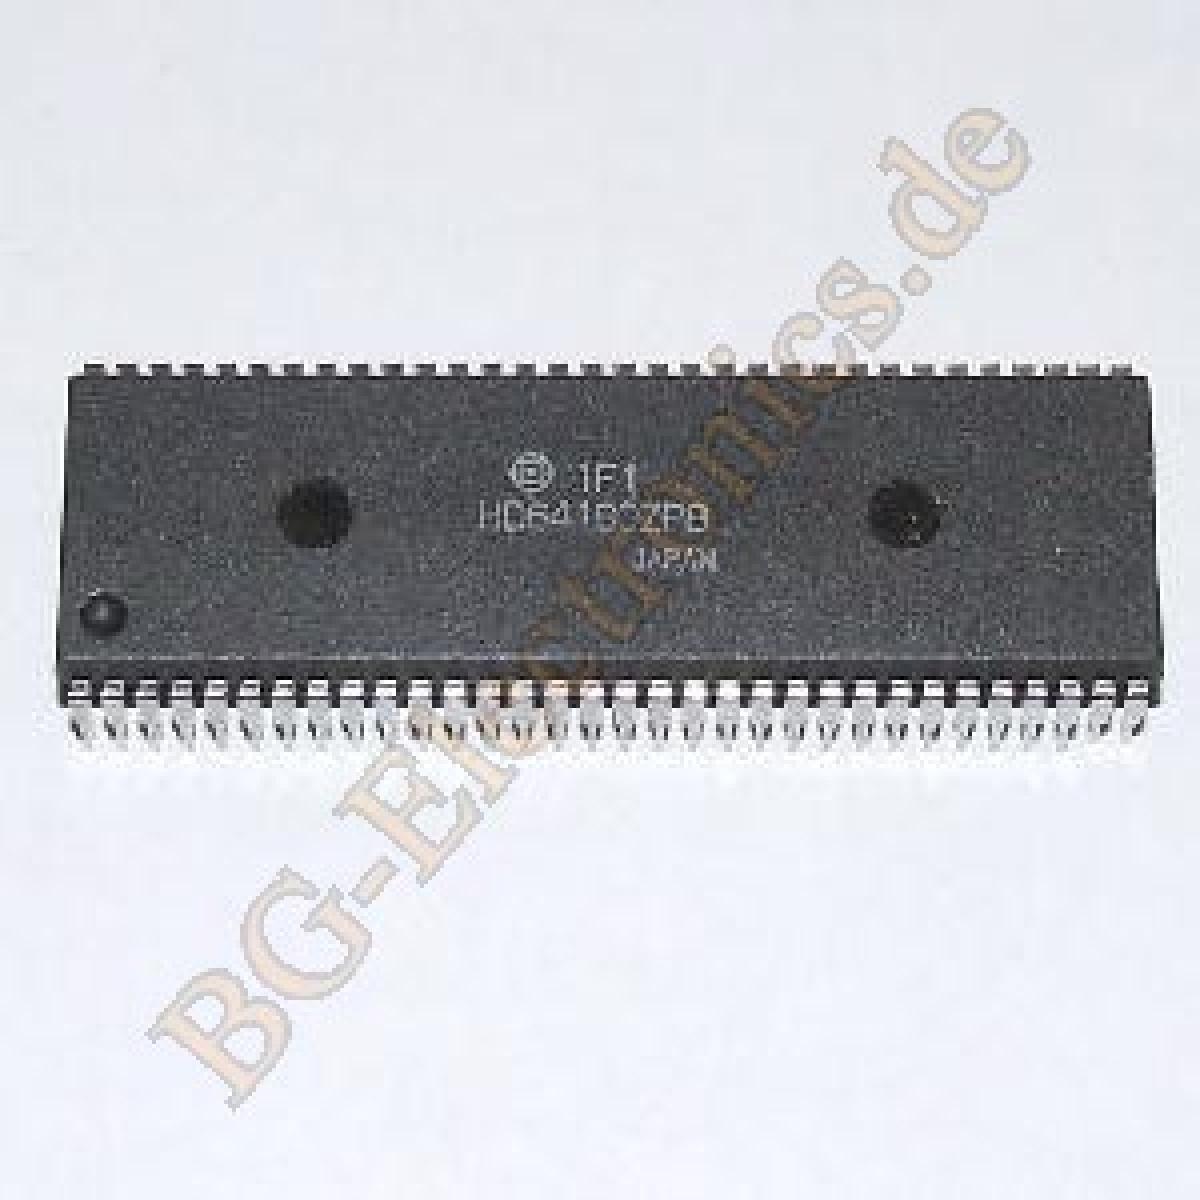 1 x hd64180zp8 8-bit microprocessor-with Dual Channel D HITACHI dip-64 1pcs